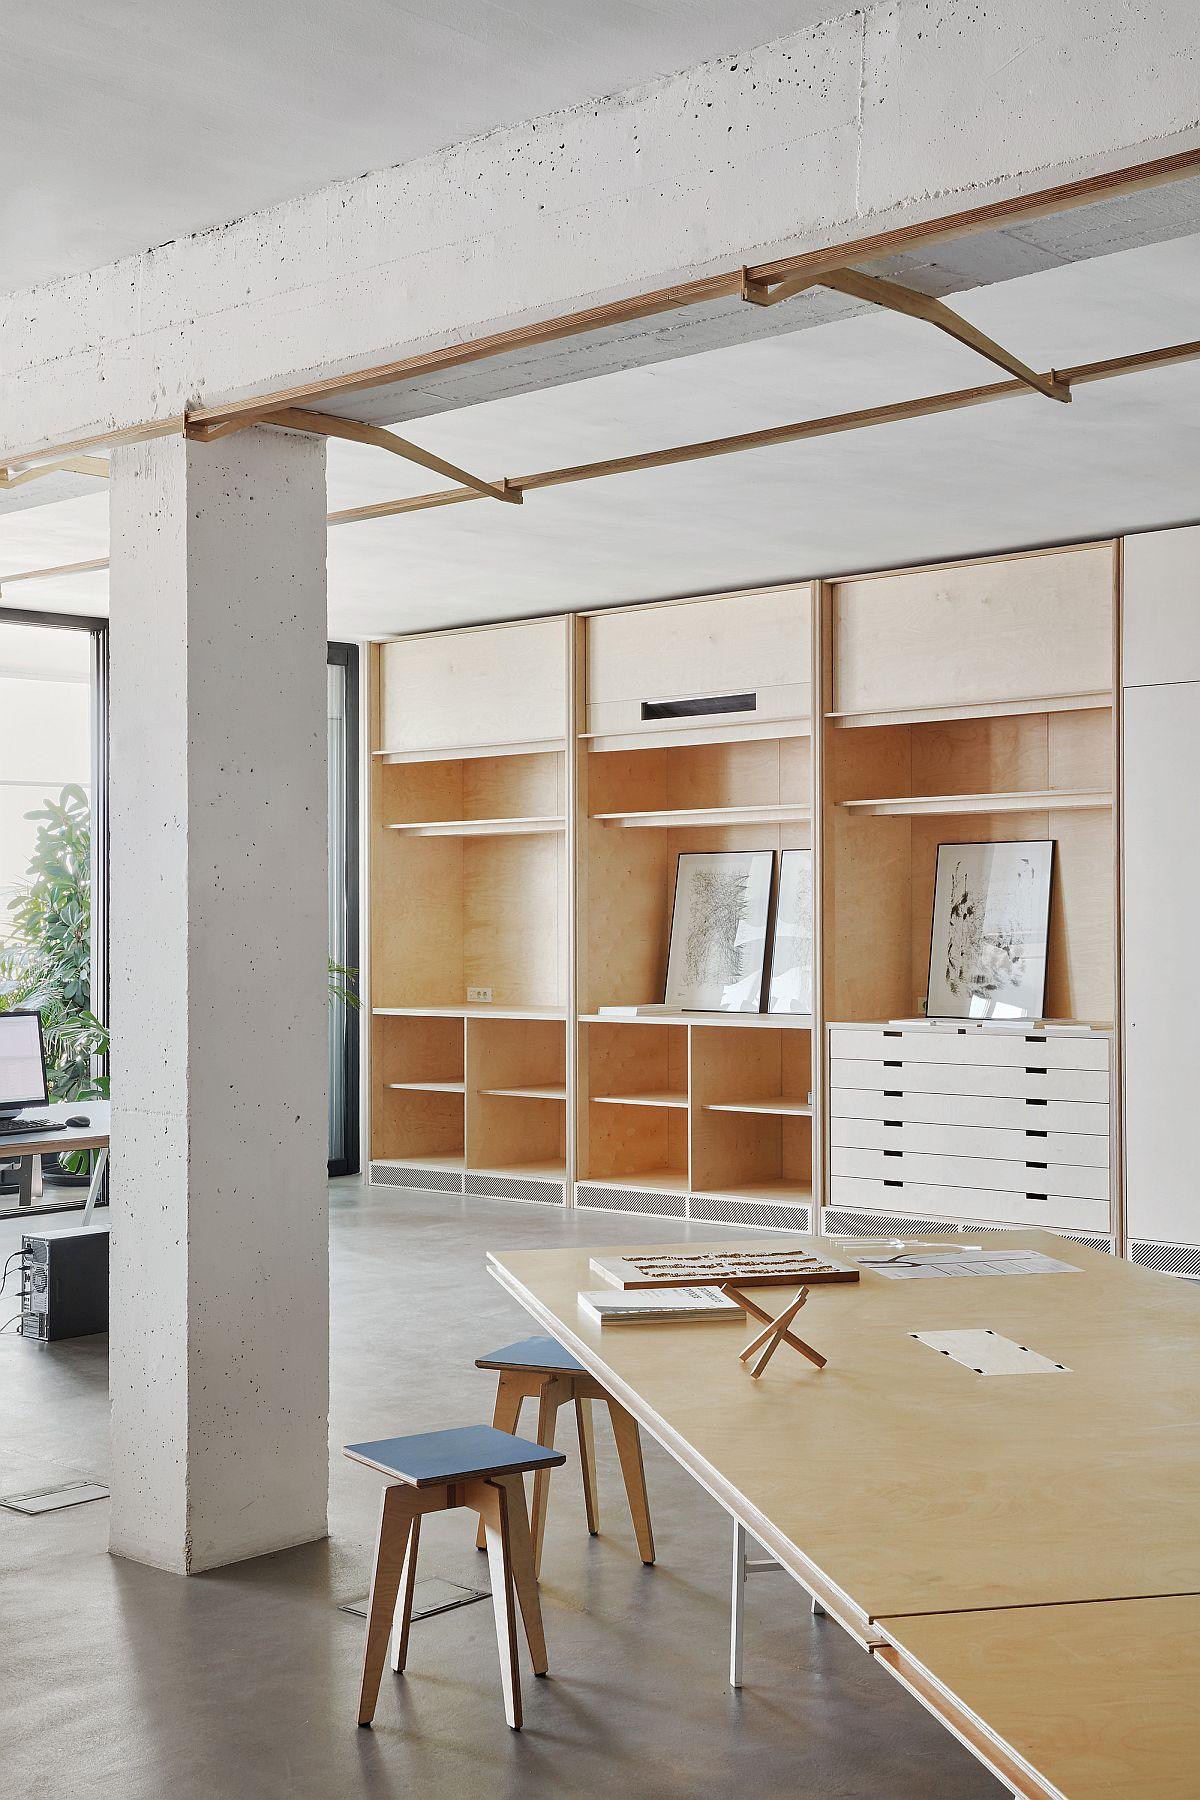 Smart design of old industrial building turned into modern design office